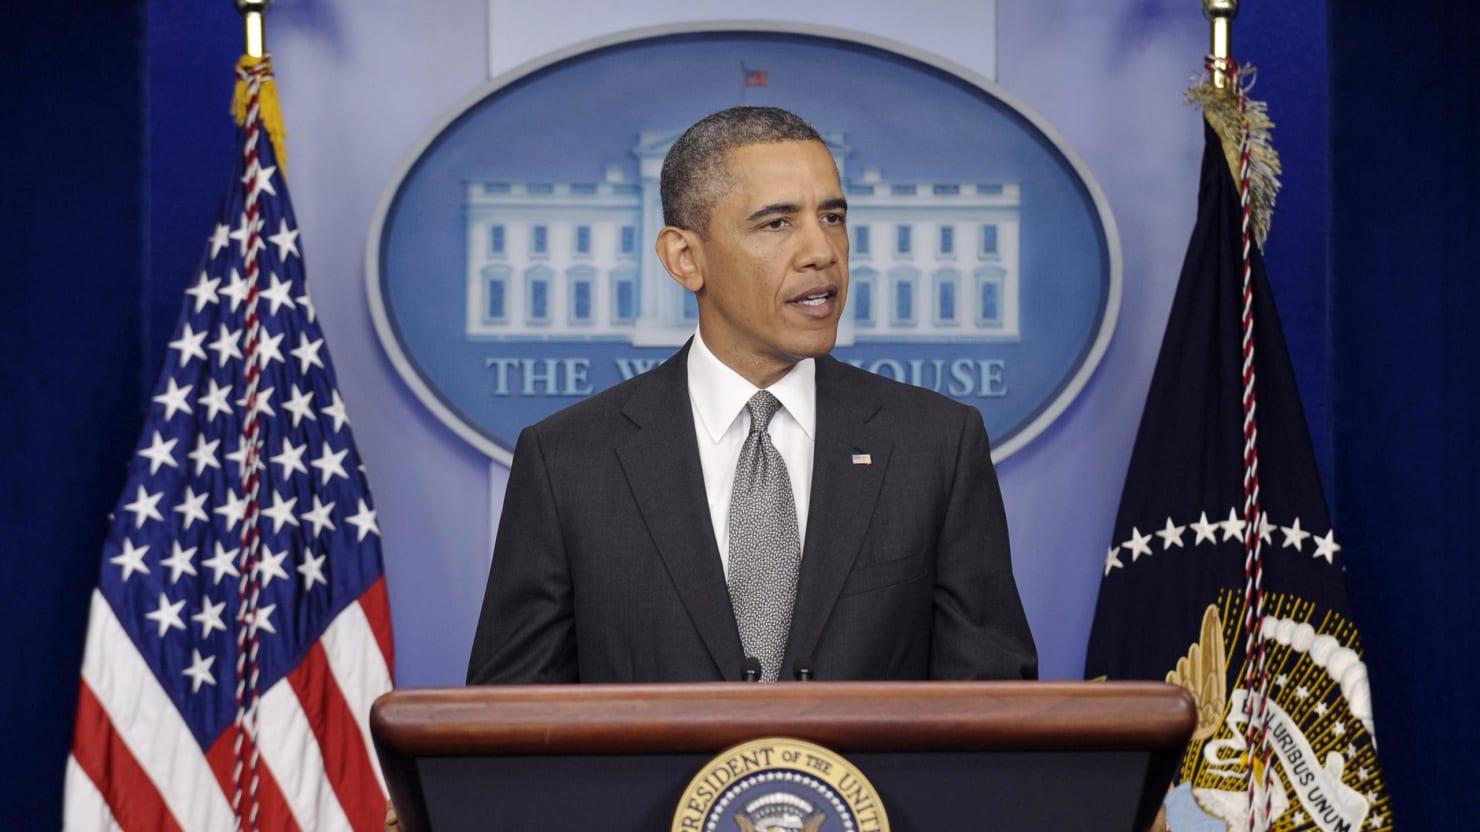 President Obama Seizes The Spotlight After The Boston